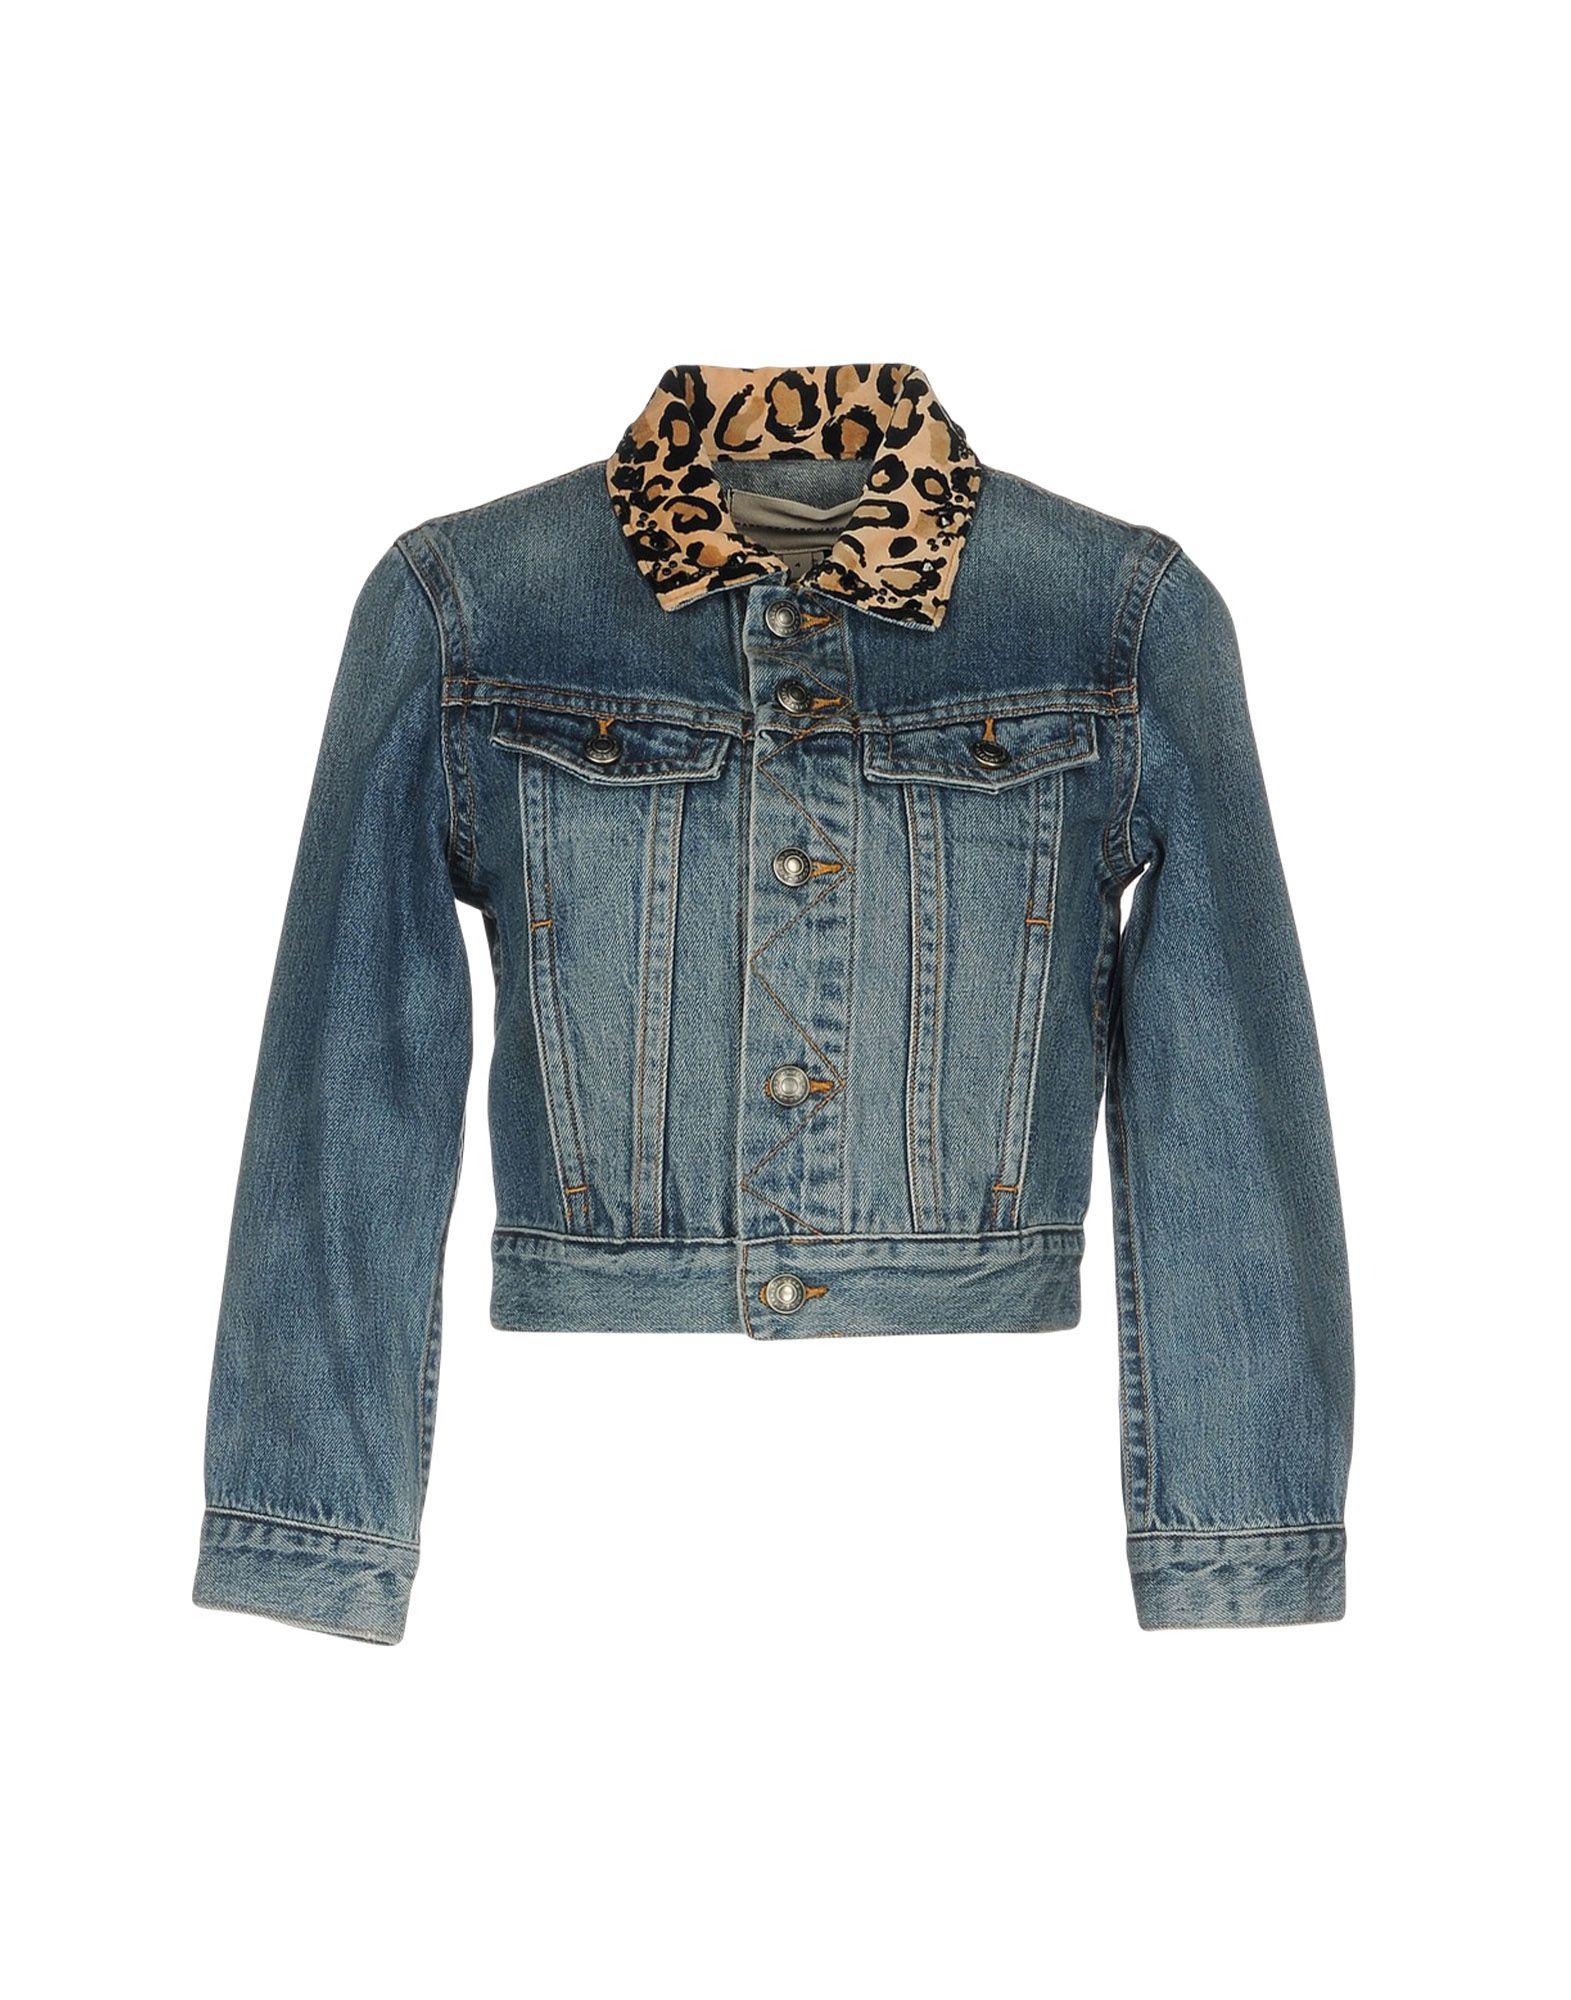 MARC BY MARC JACOBS Джинсовая верхняя одежда marc by marc jacobs джинсовая рубашка